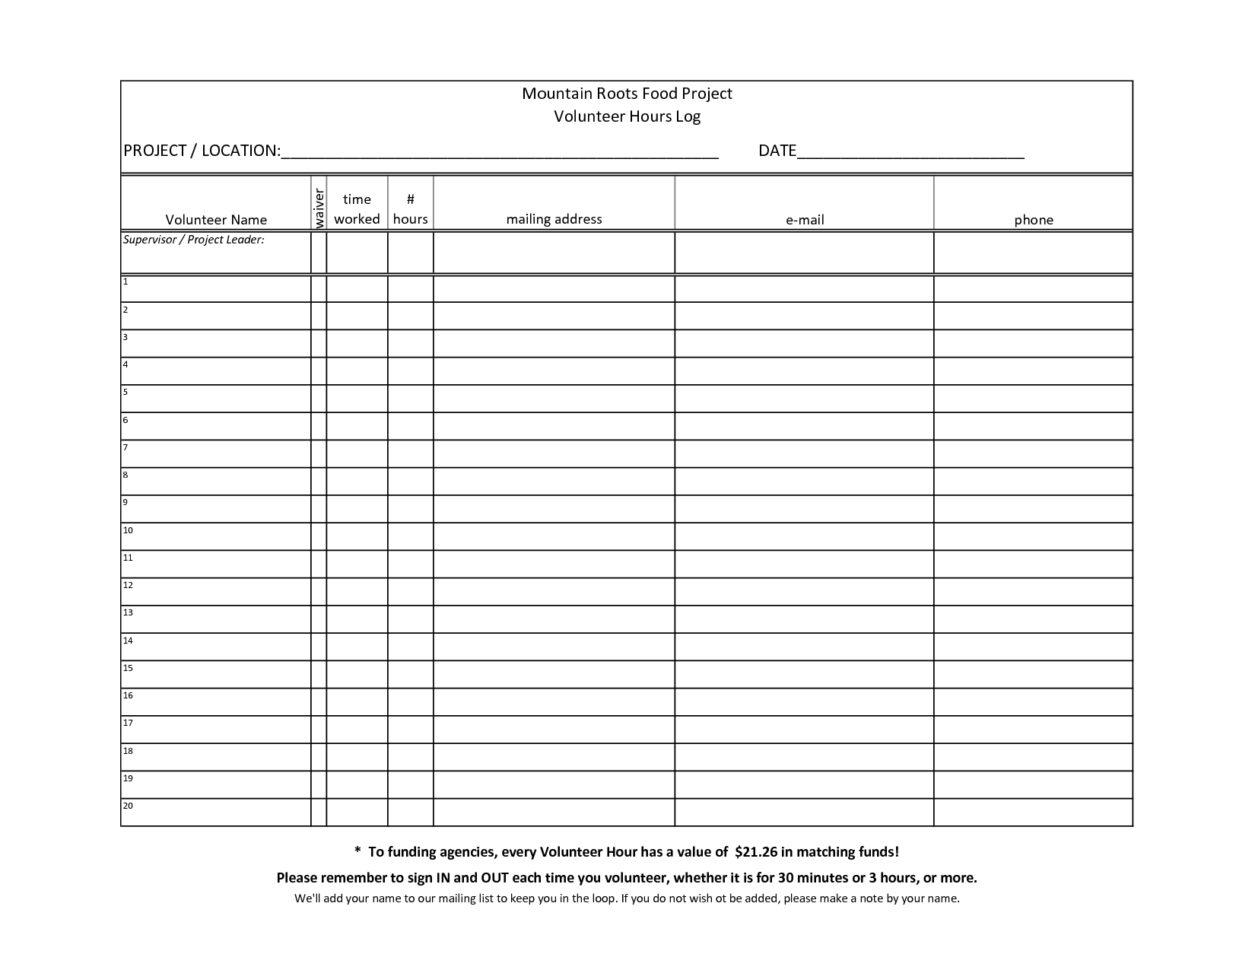 Volunteer Tracking Spreadsheet Template With Regard To Fearsome Volunteer Hours Log Template ~ Ulyssesroom